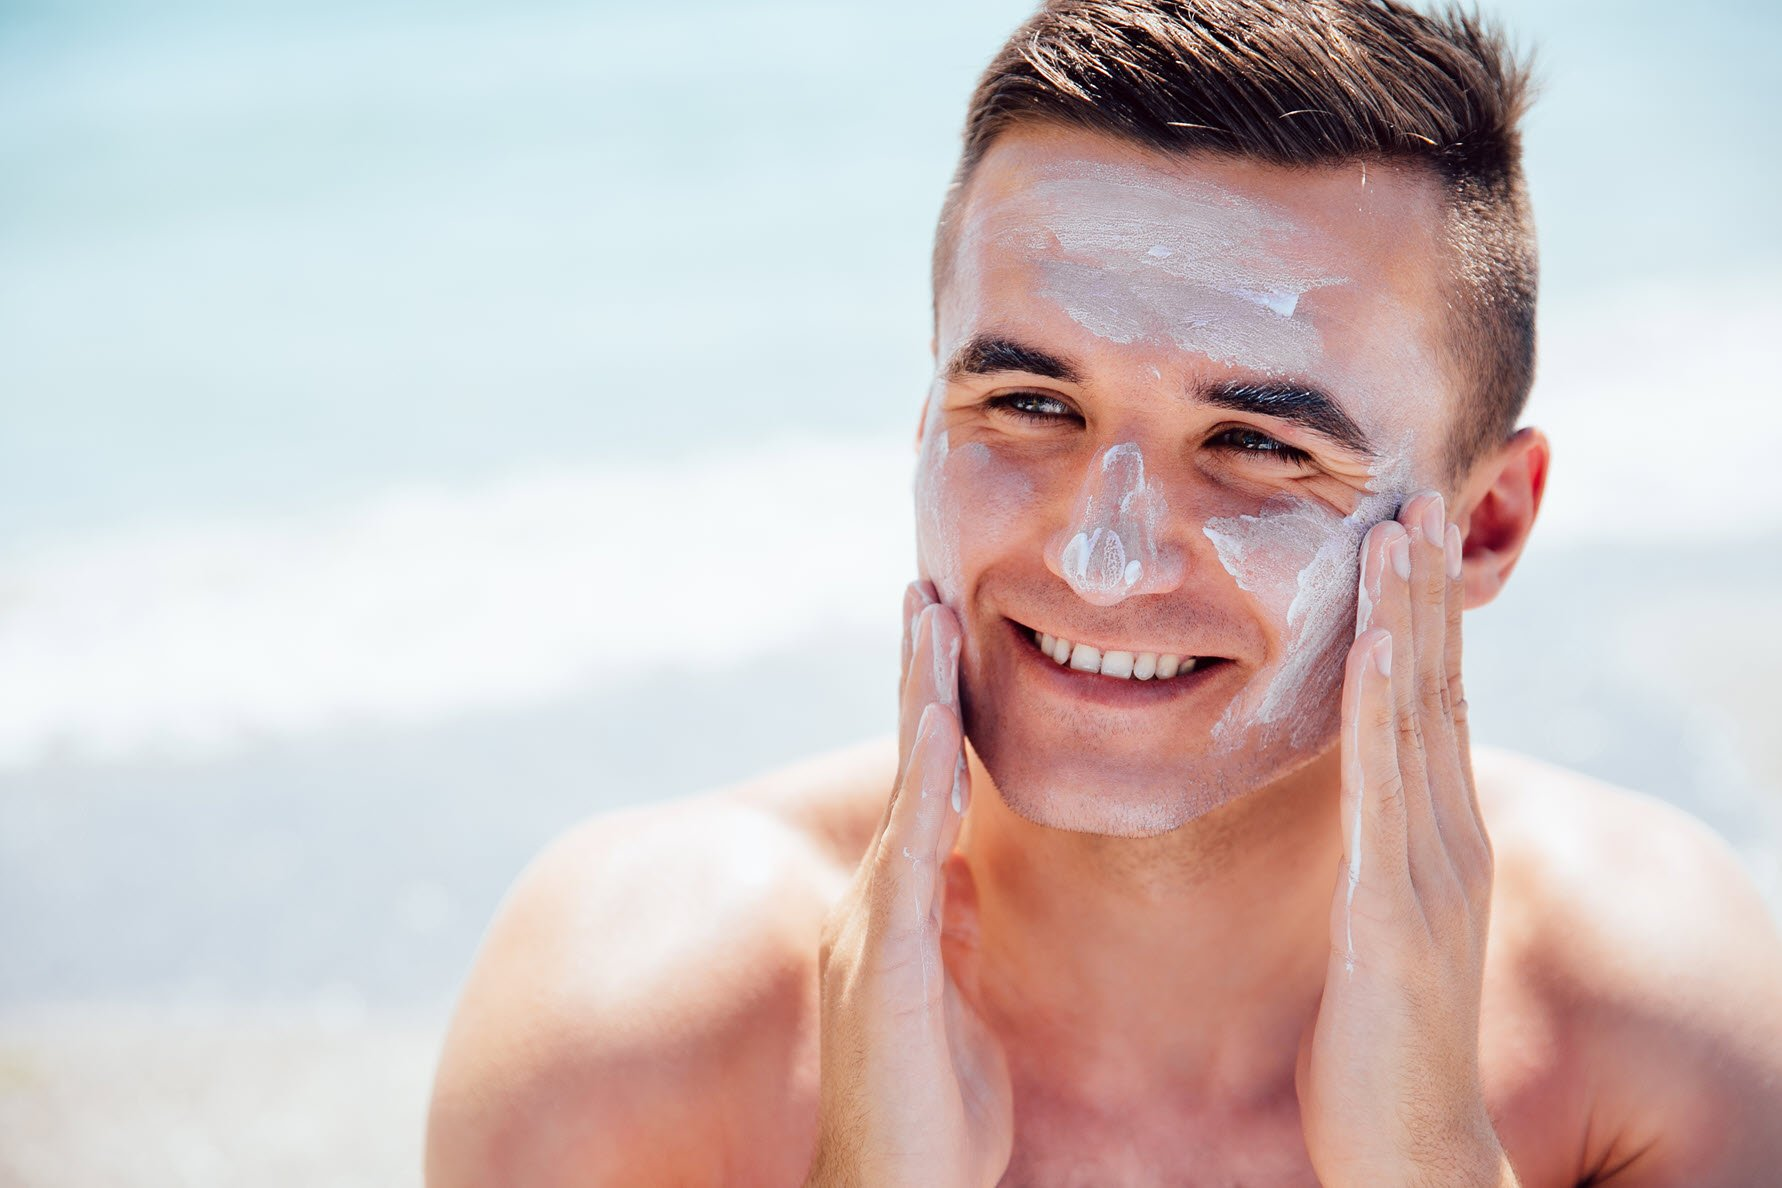 Wear Sunscreen Every Day